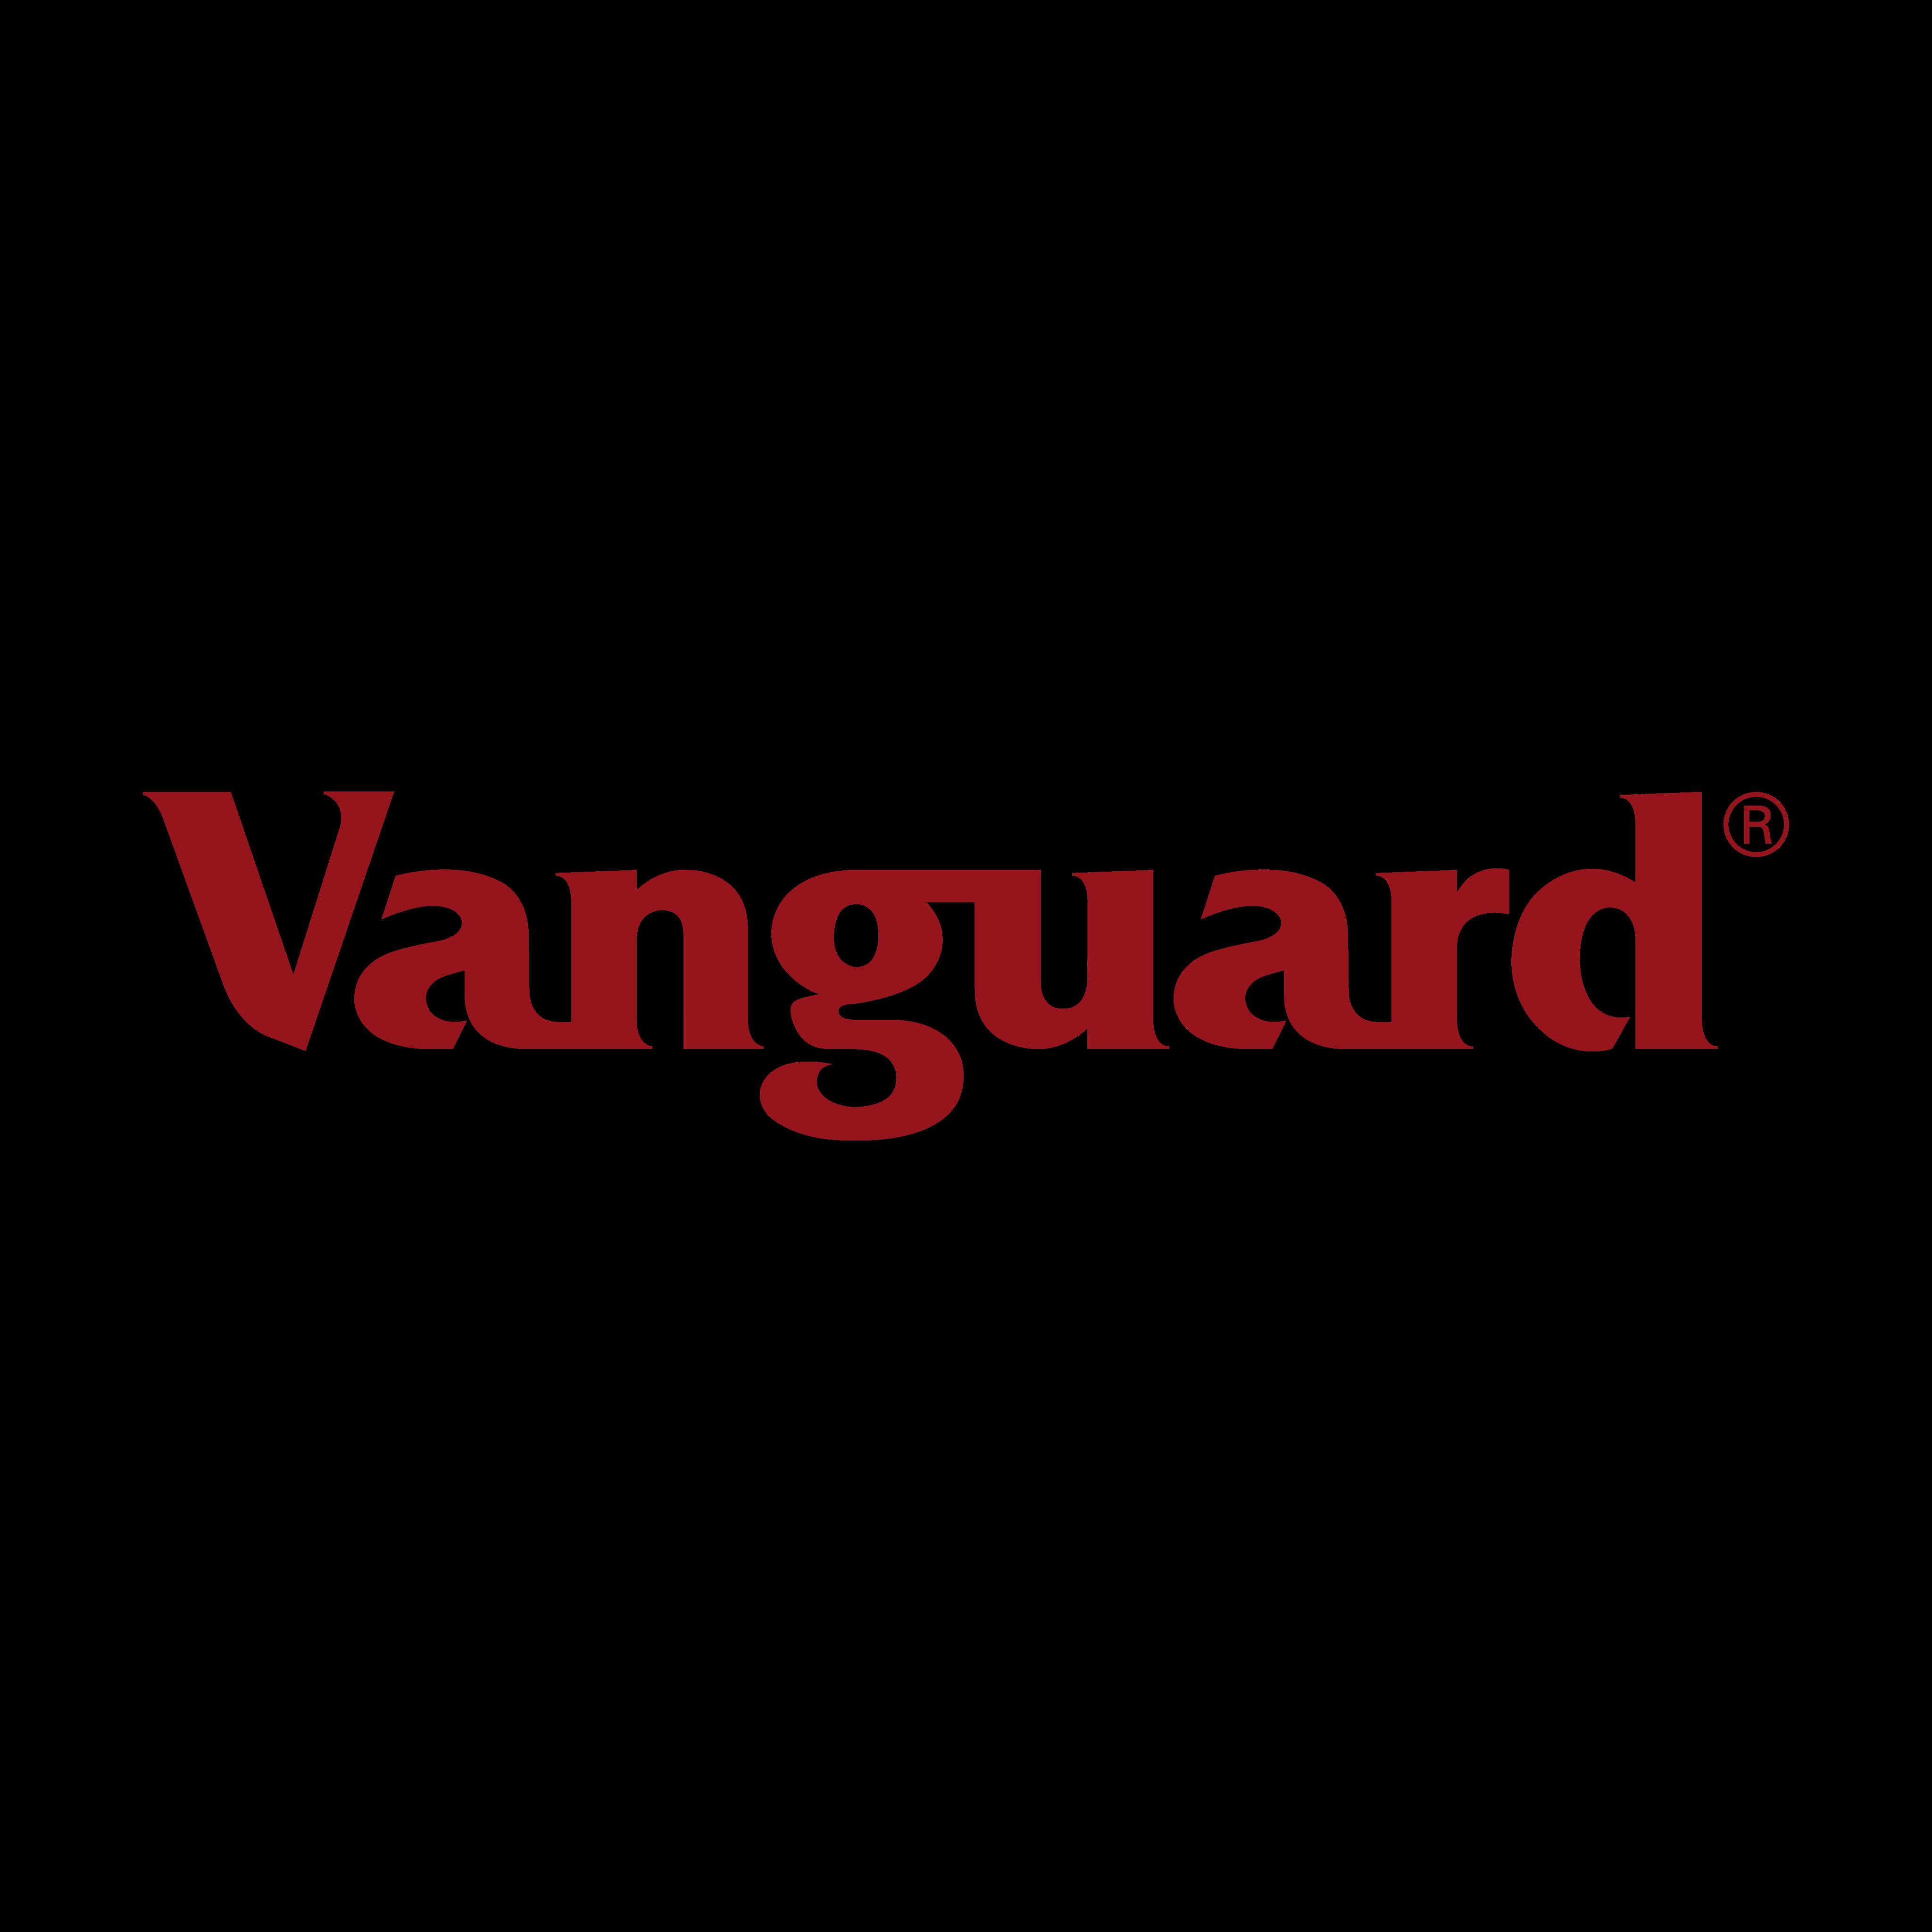 vanguard investiments logo 0 - Vanguard Group Logo